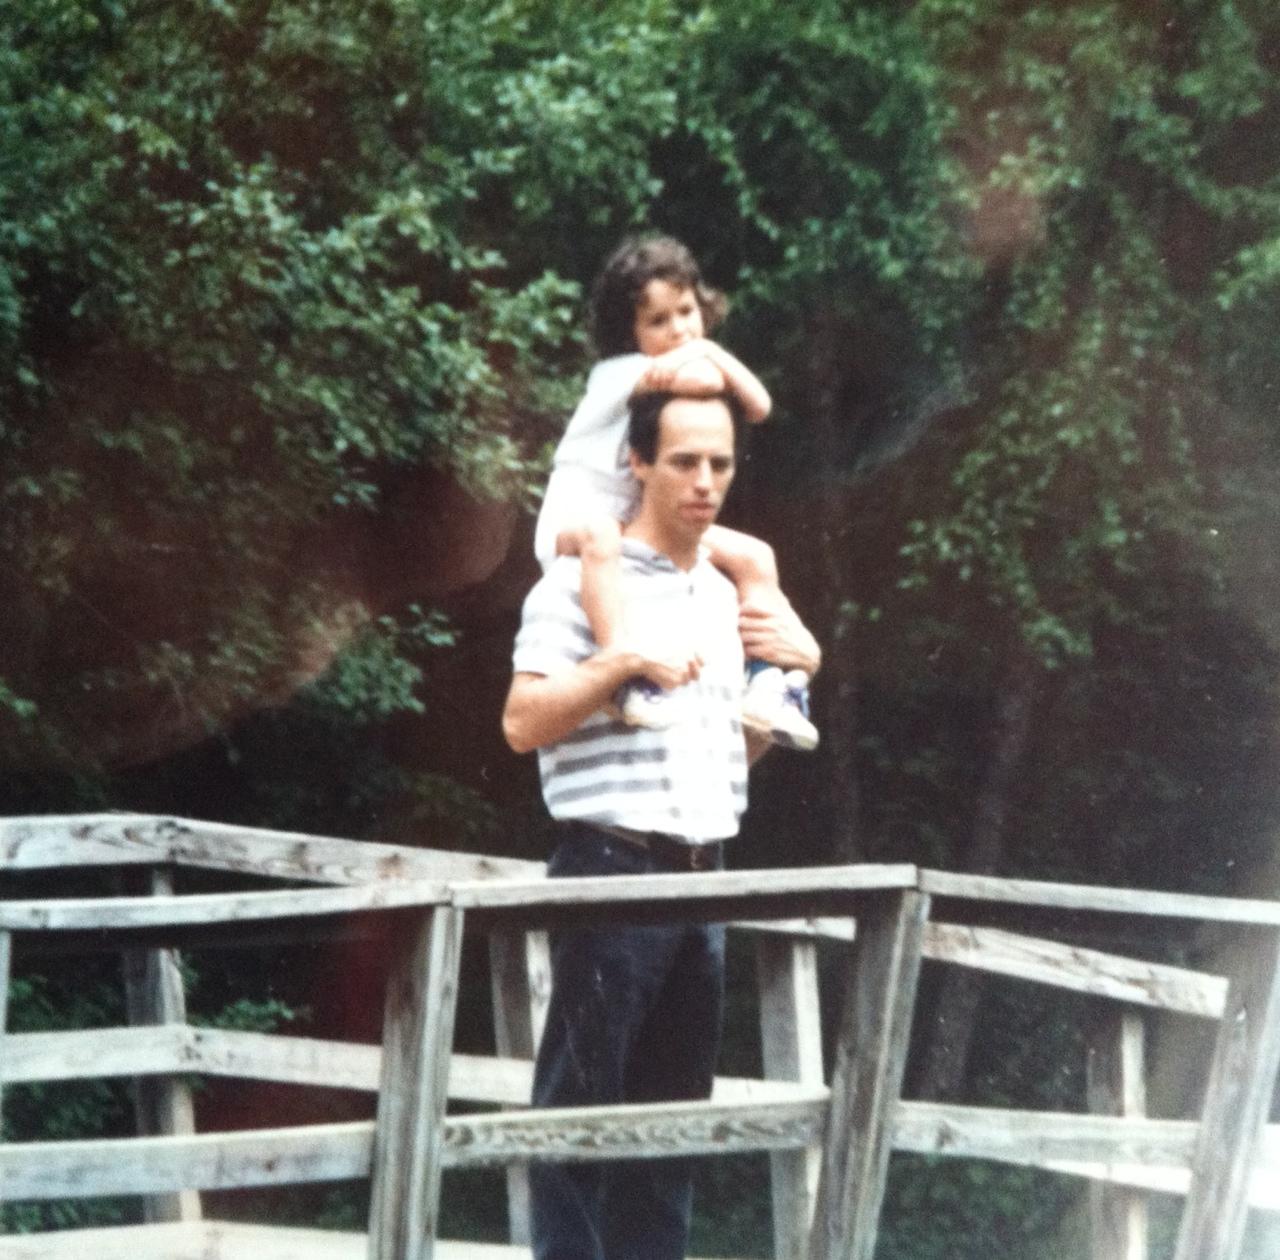 parent and child enjoying nature